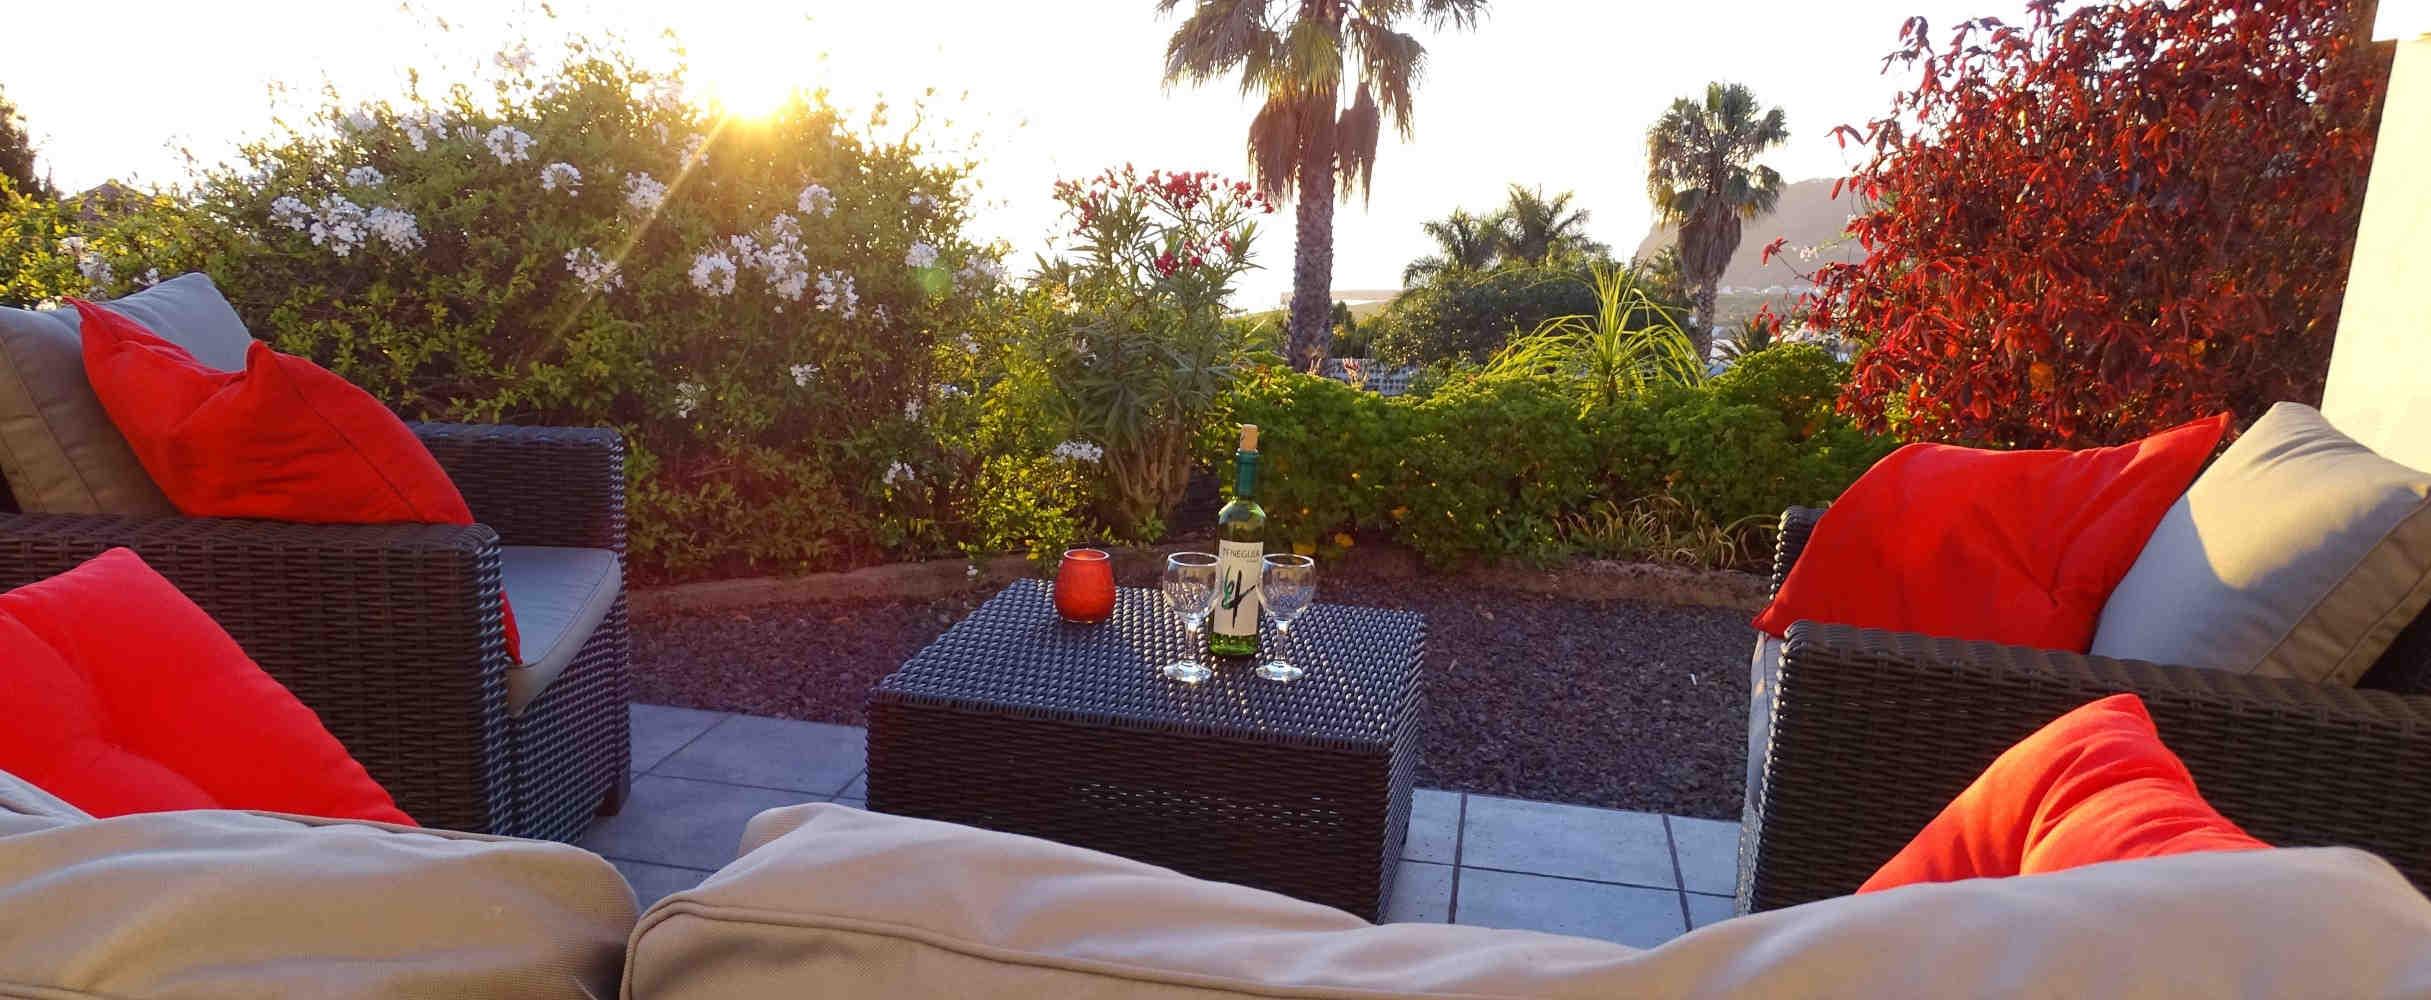 terras vakantiehuizen la palma